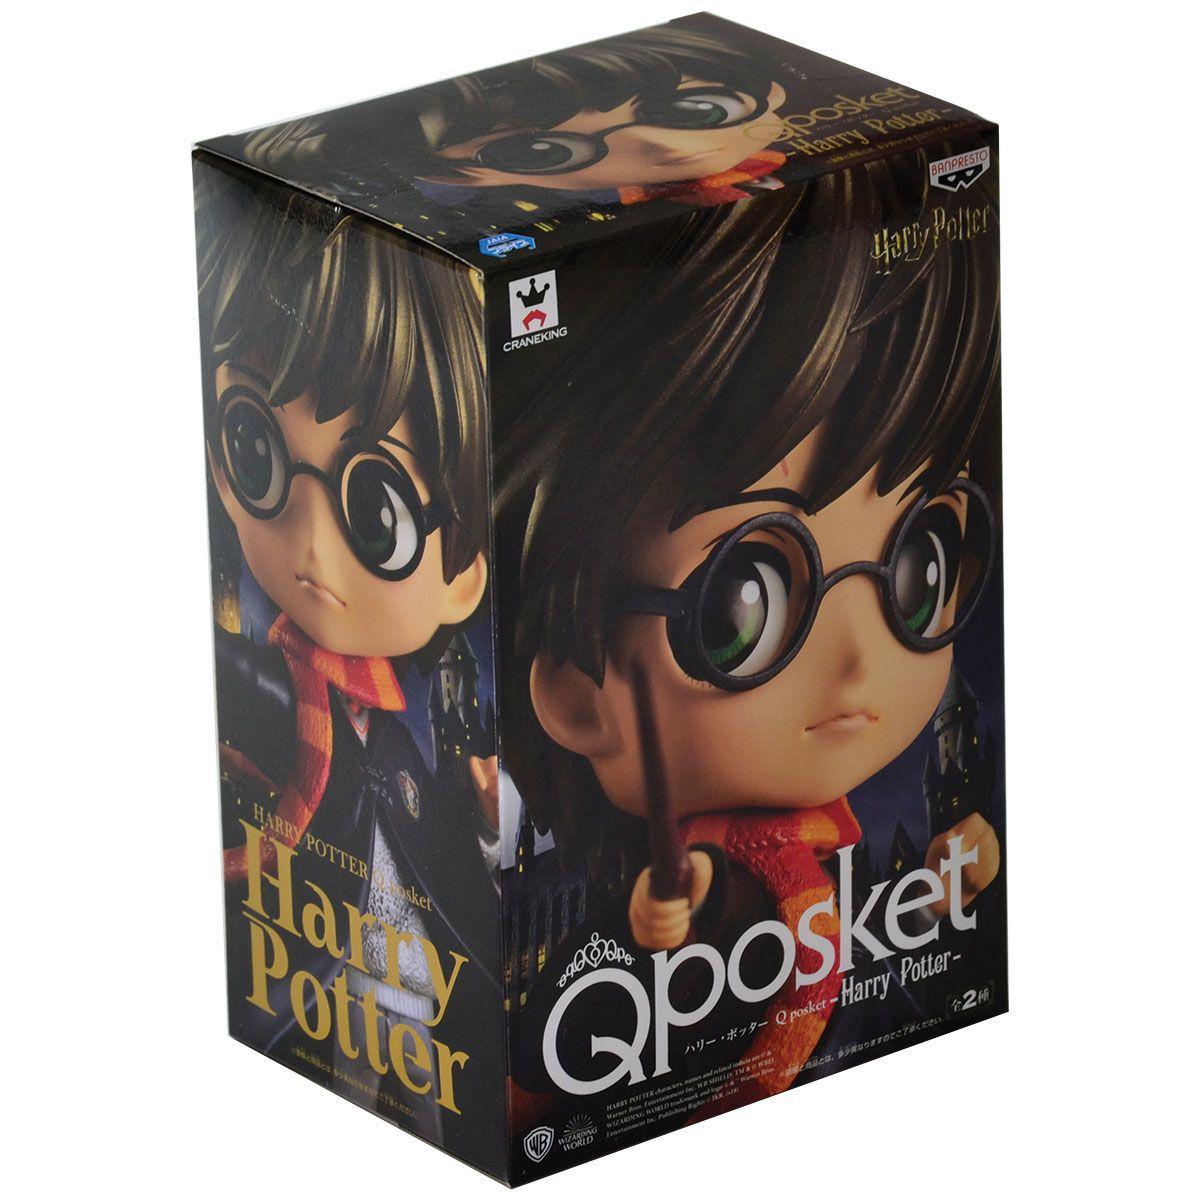 Estátua Harry Potter: Harry Potter Qposket - Banpresto